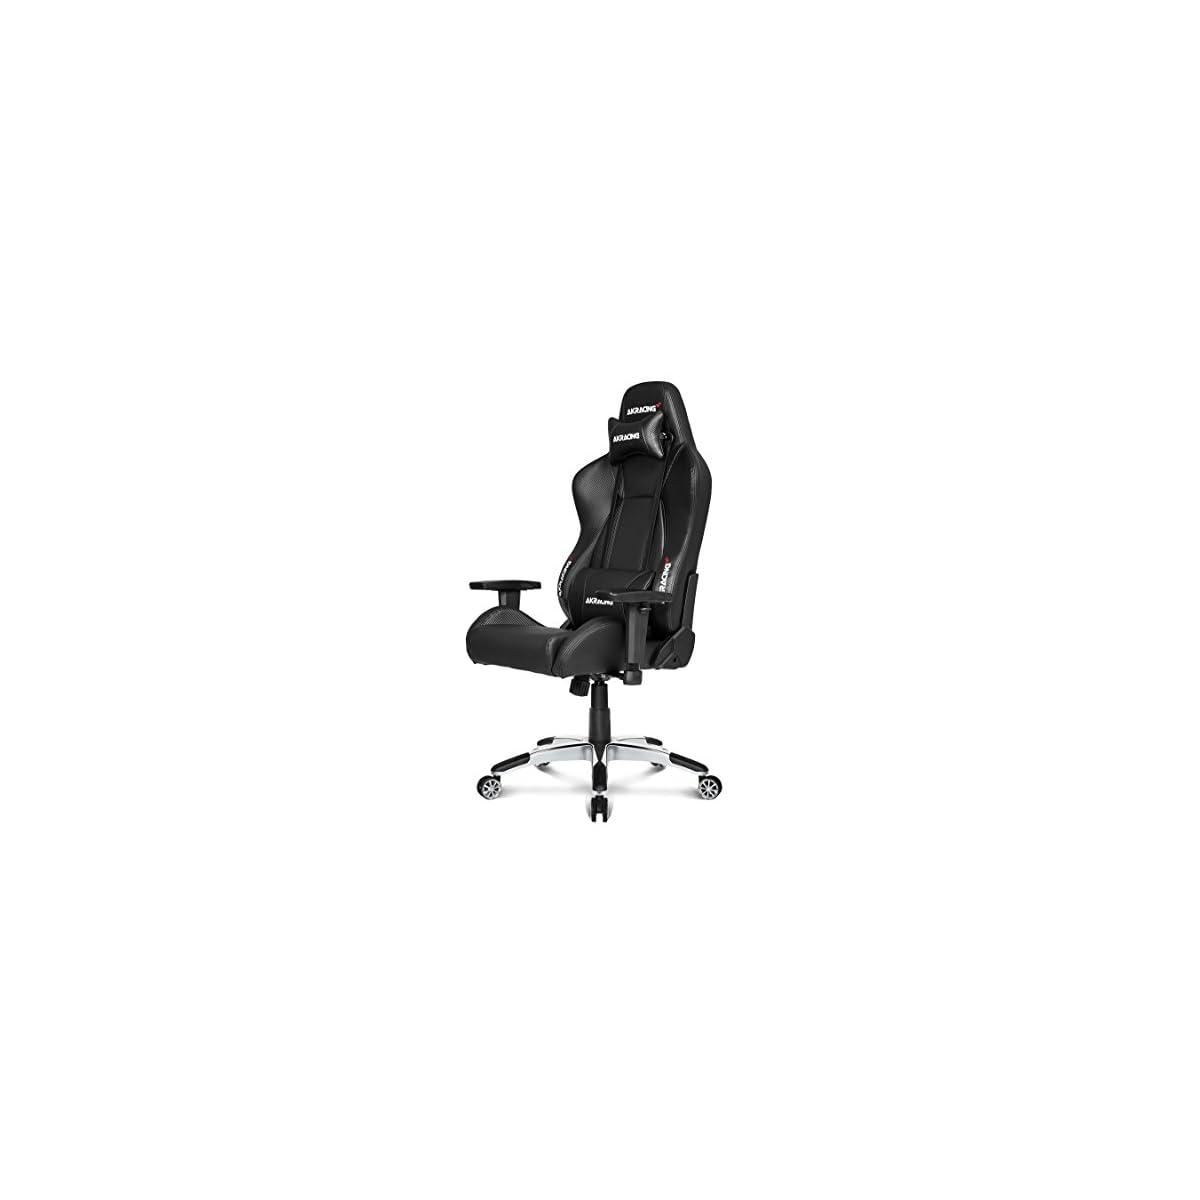 41Cy0 gfo%2BL. SS1200  - AKRacing Premium V2 - AK-7002-CB - Silla Gaming, Color Negro Carbono